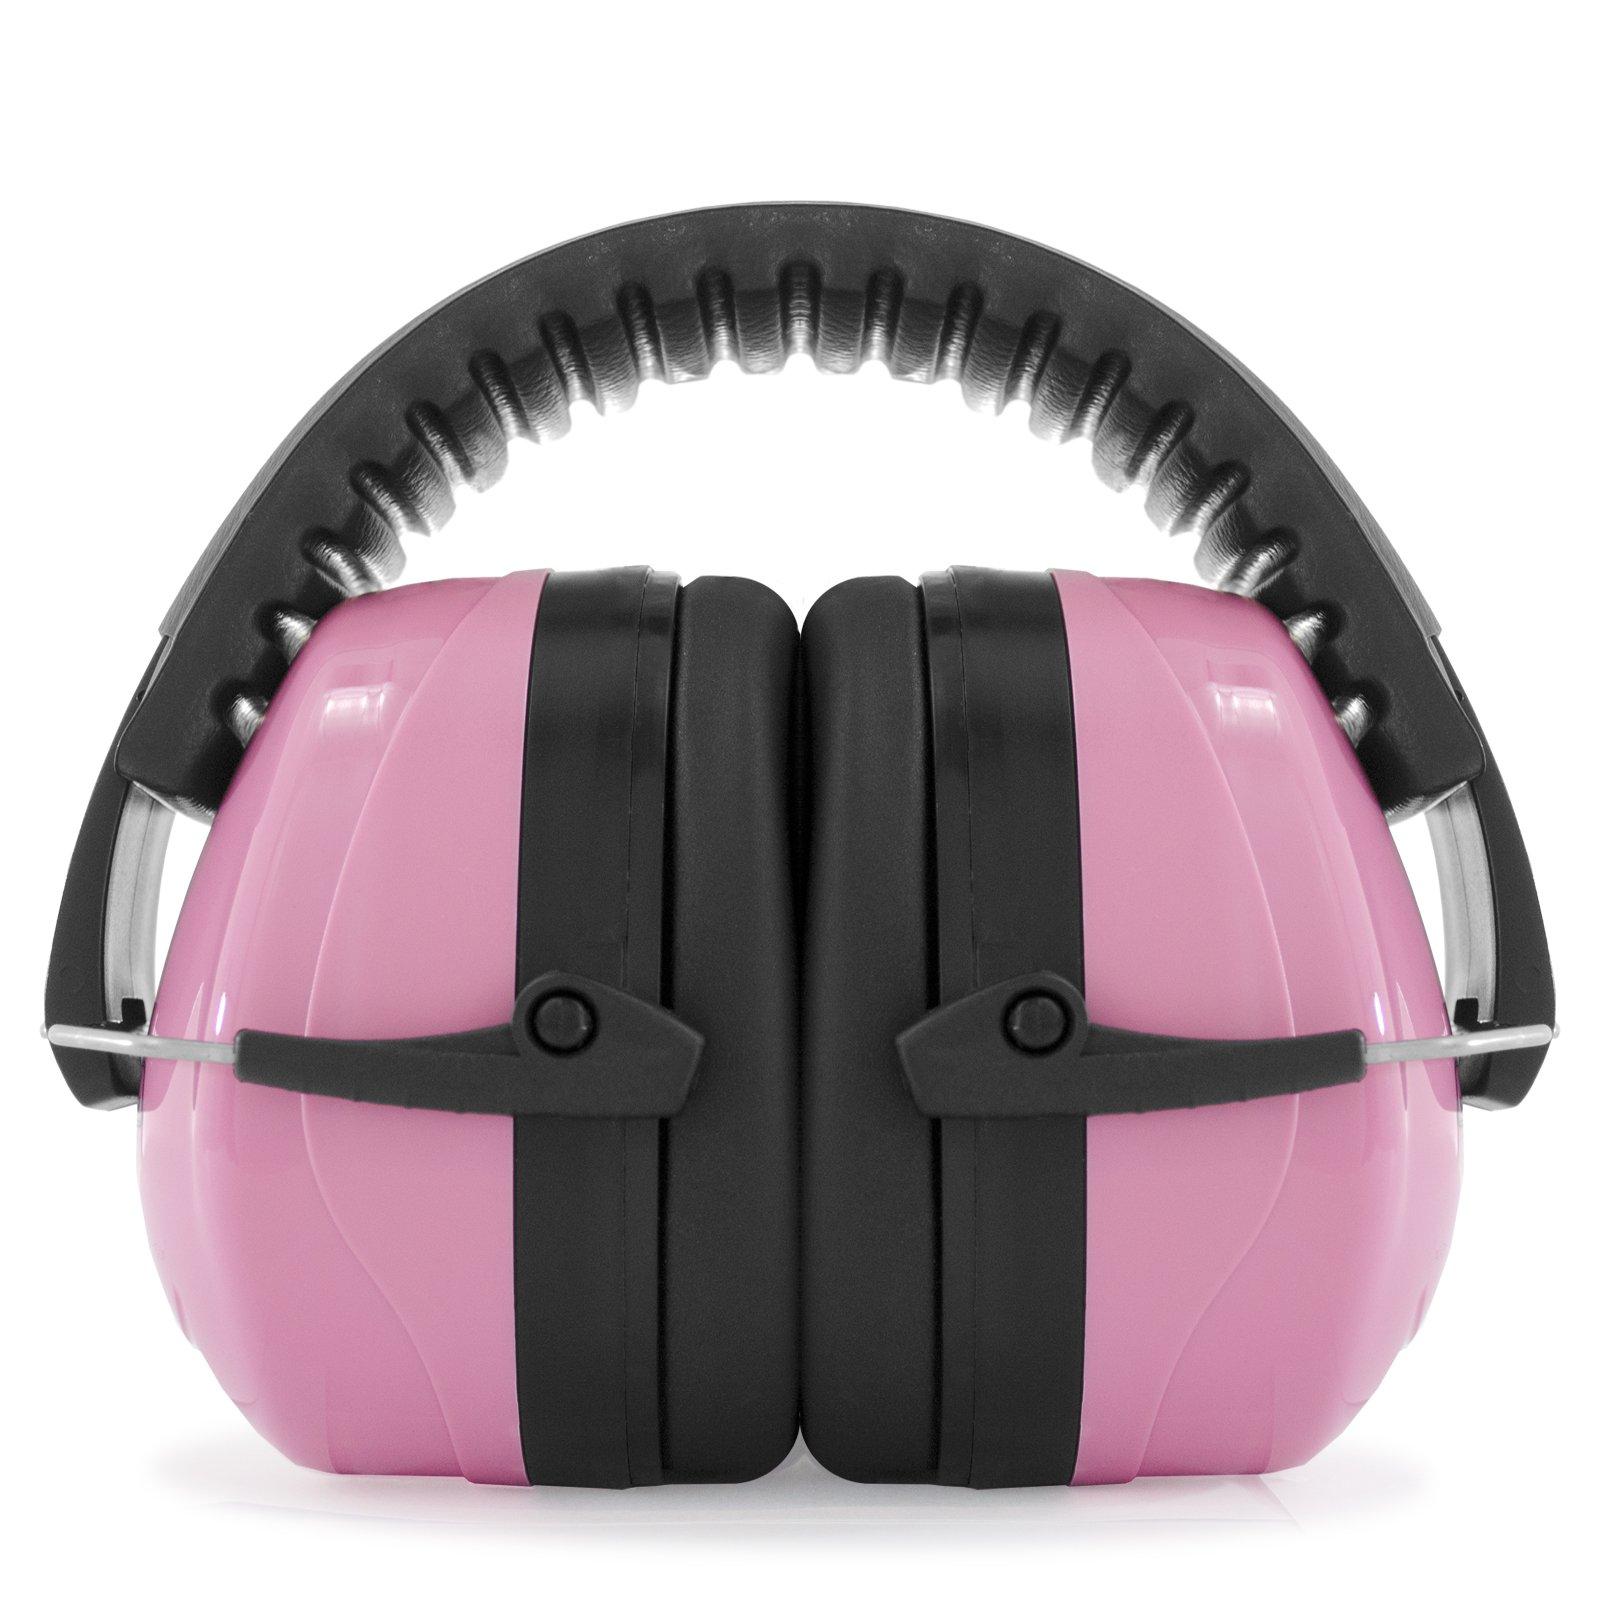 JORESTECH EAR MUFF LUXURY STYLE 27 dB NRR Premium Quality (Pink)